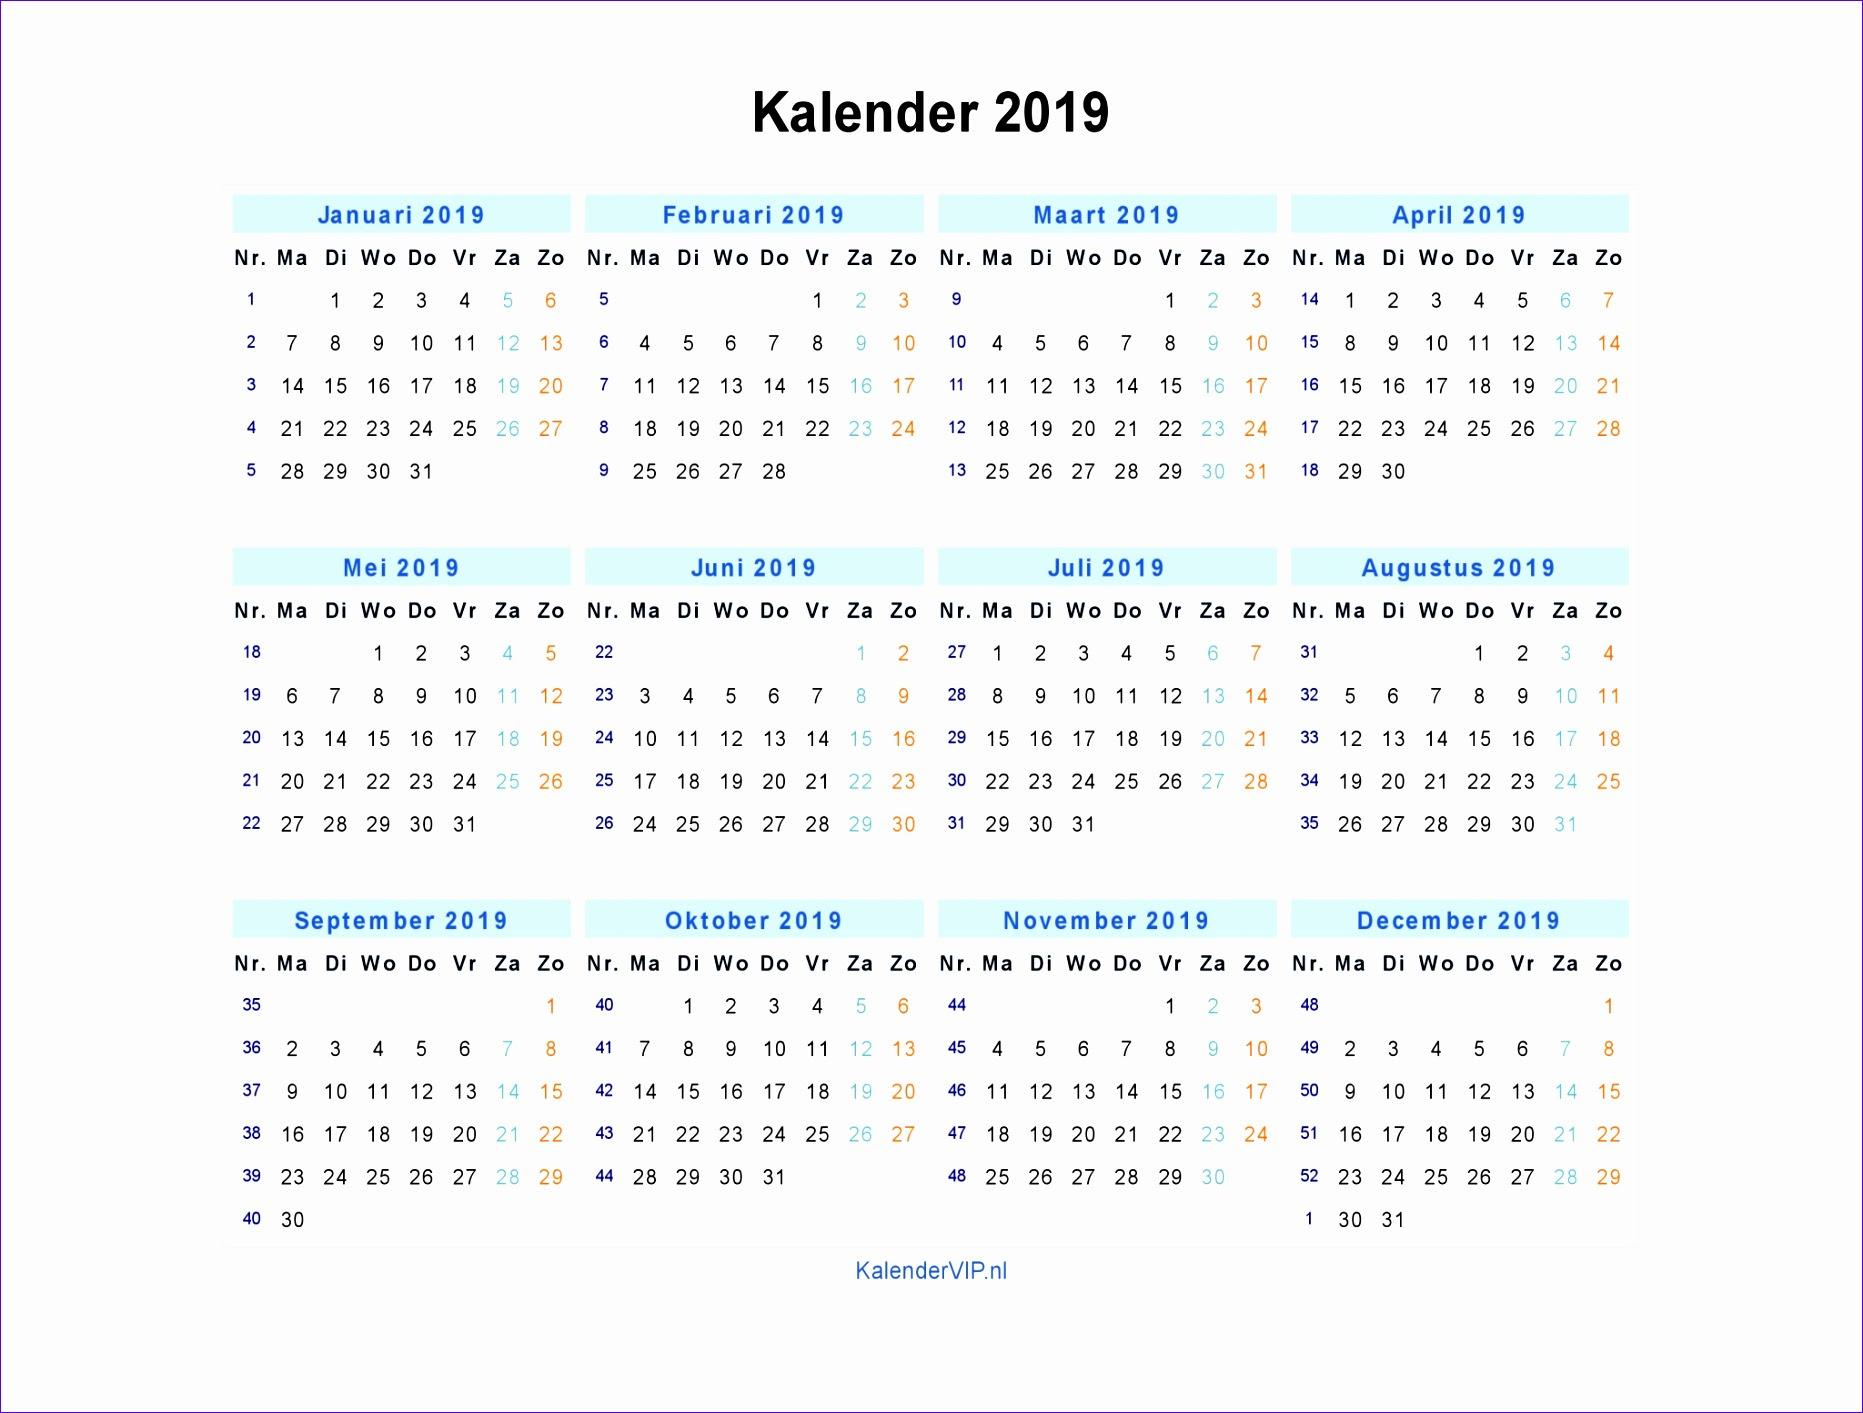 calendar 2014 template excel s6evd inspirational kalender 2019 jaarkalender en maandkalender 2019 met of calendar 2014 template excelp3e639